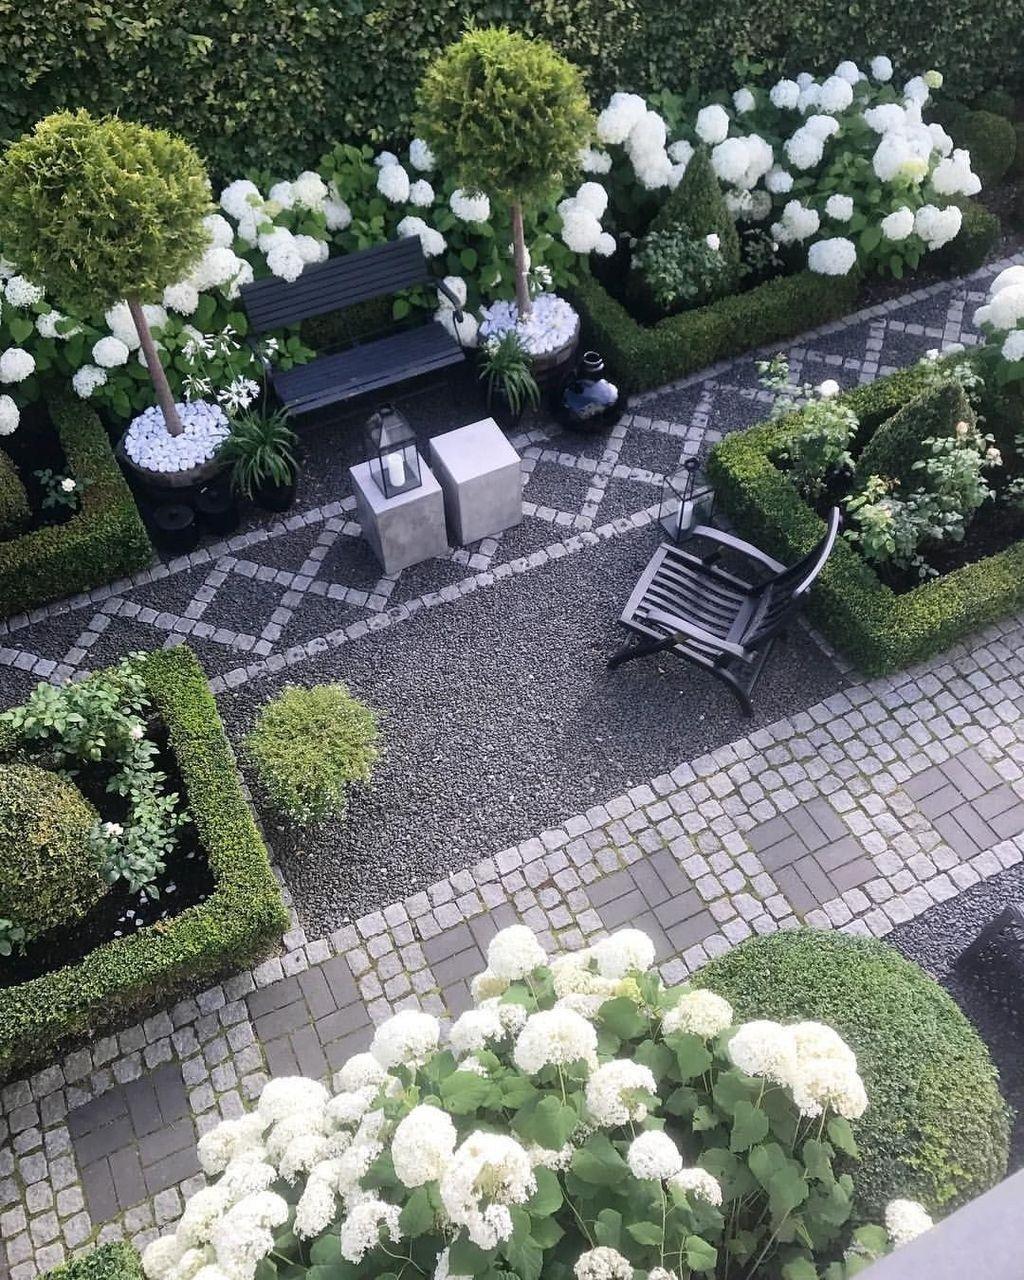 Garden Ideas Designs And Inspiration: 30+ Fantastic Side Yard Garden Design Ideas For Your